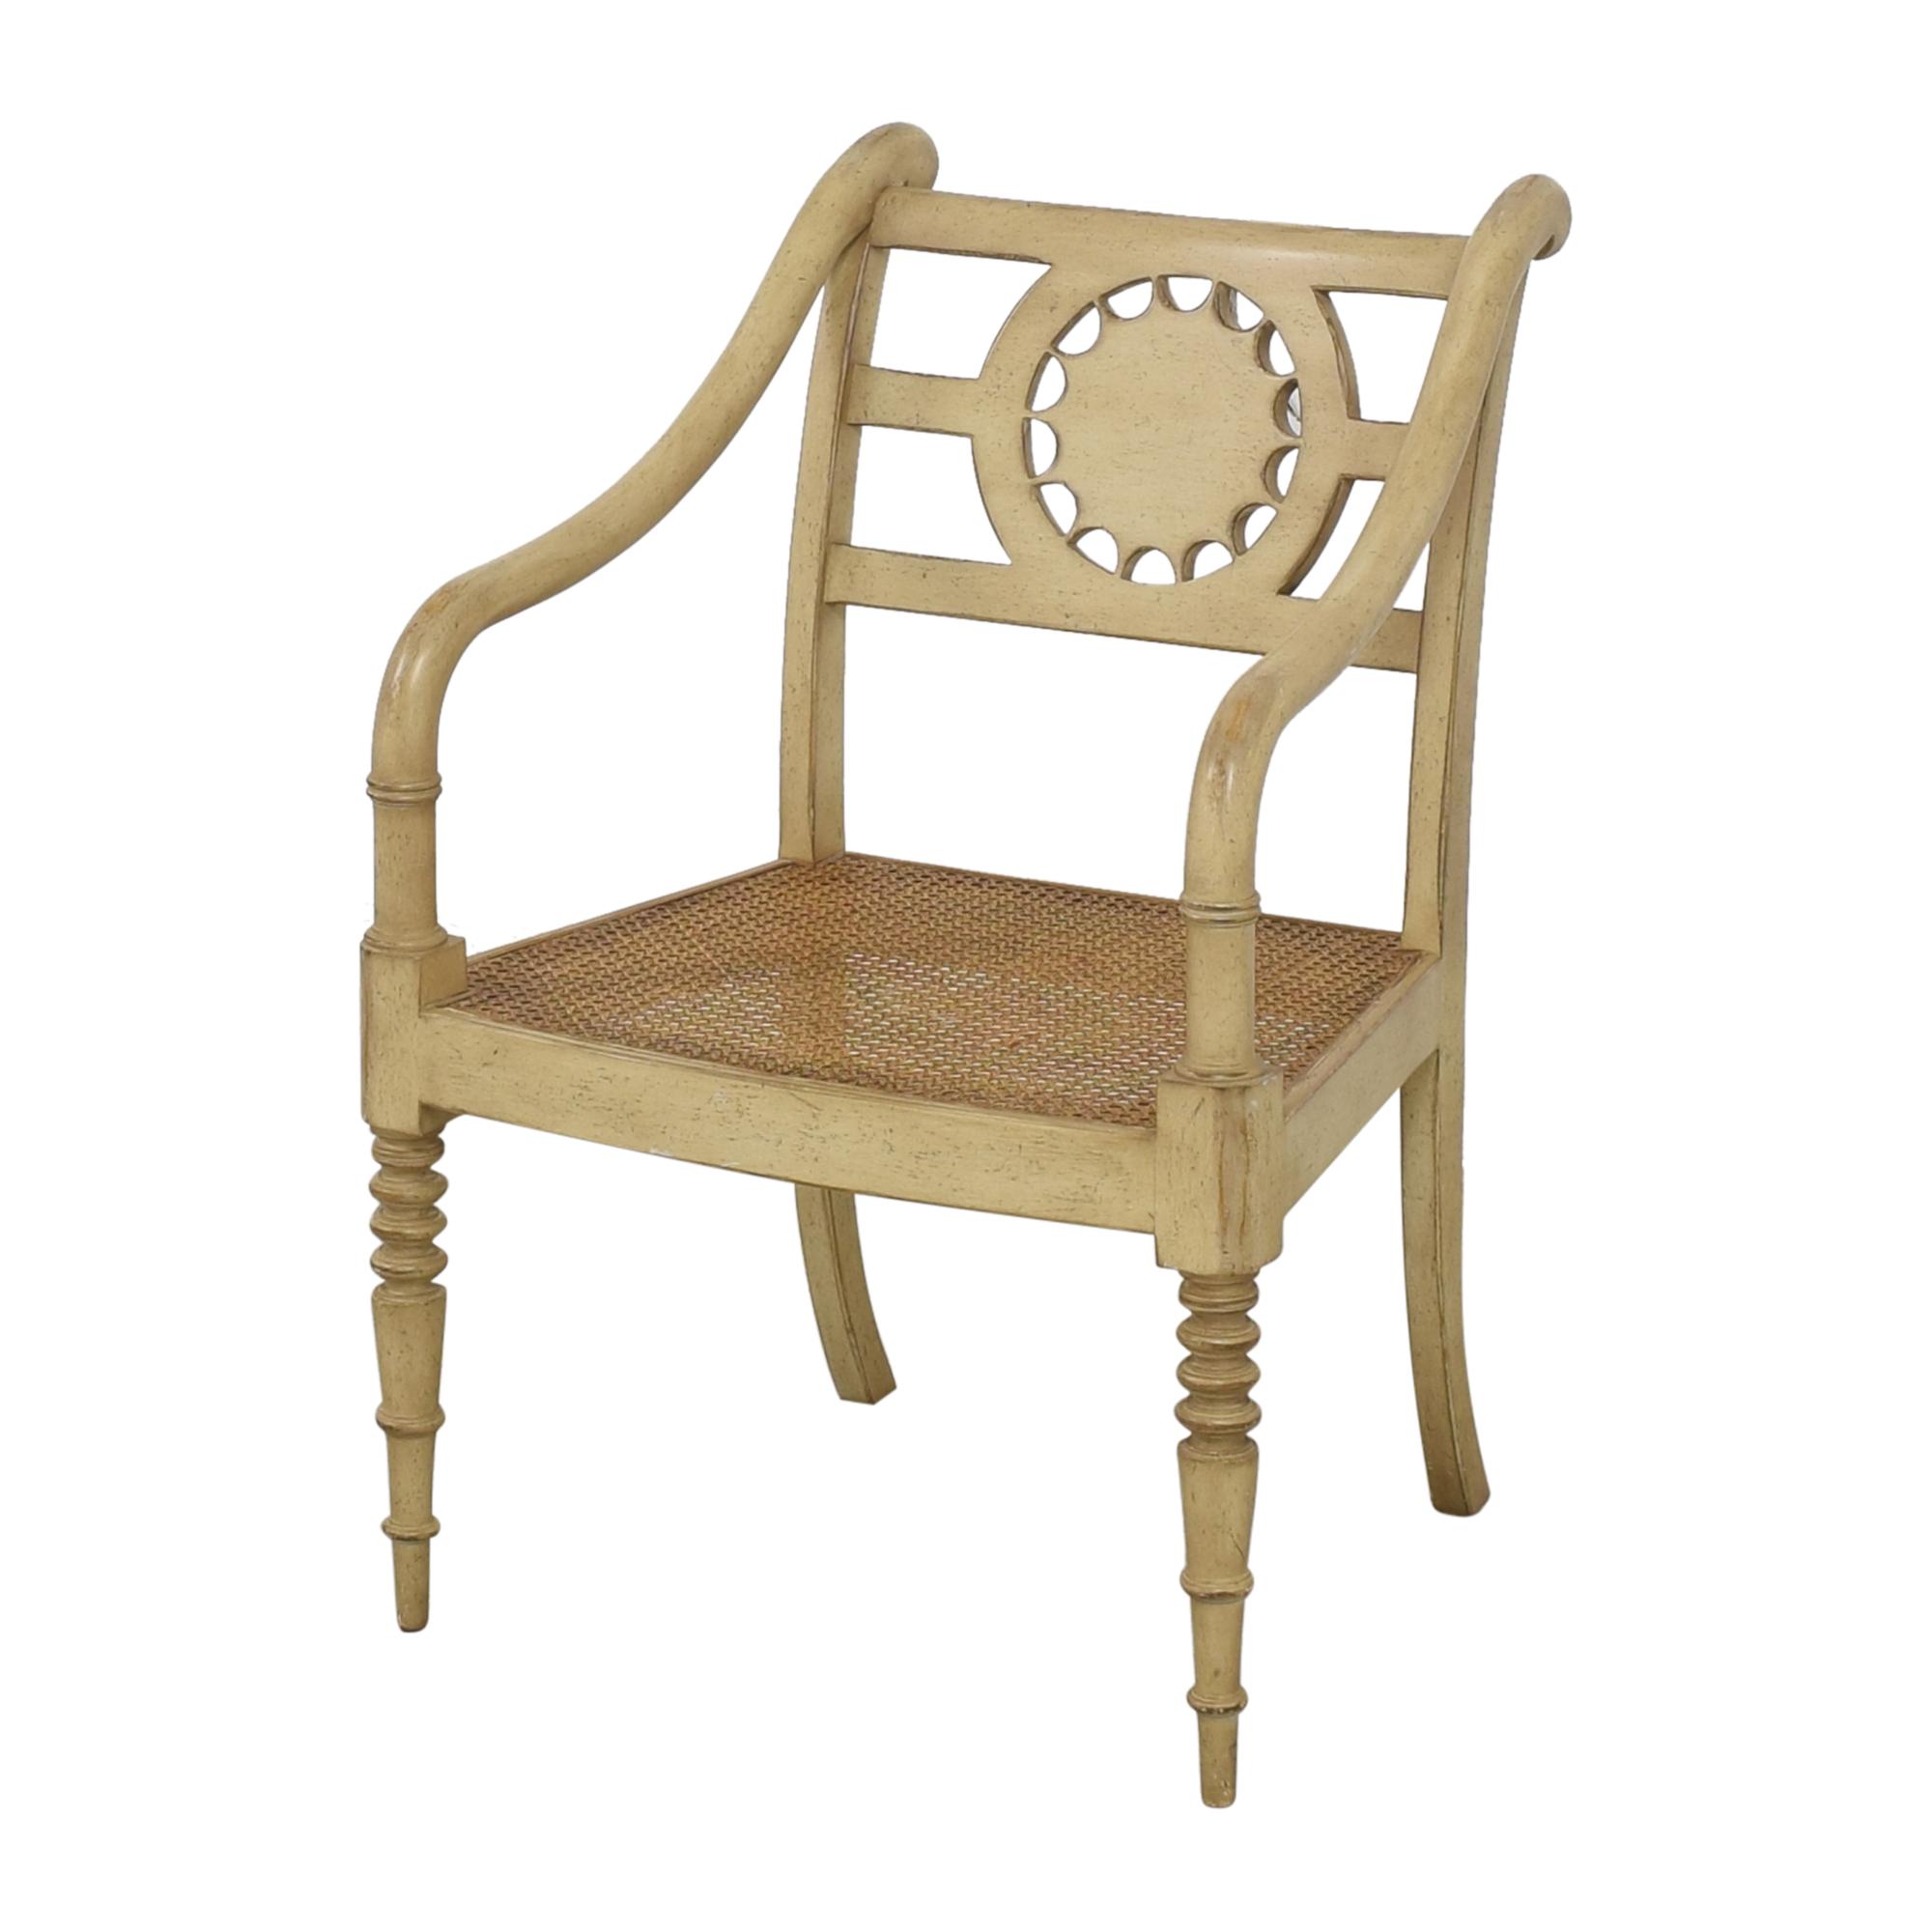 shop Baker Furniture Baker Furniture Cane Seat Accent Chair online